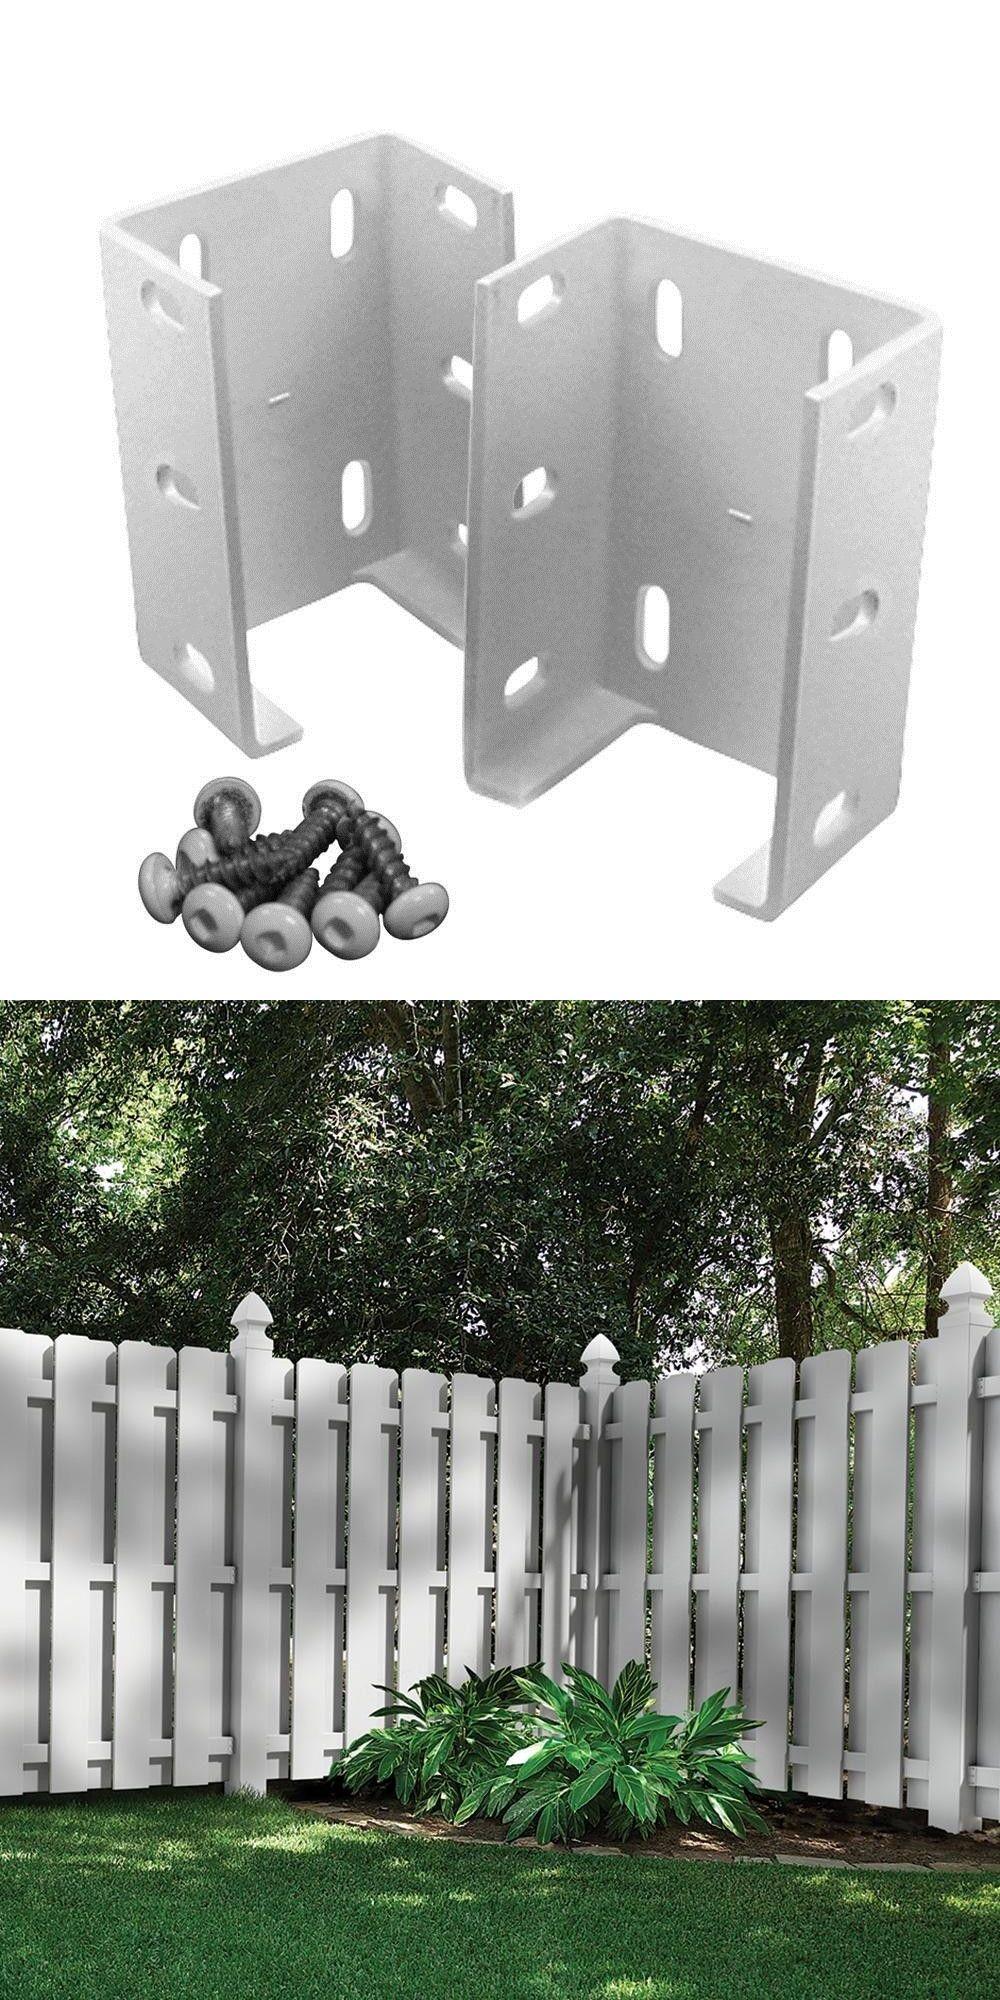 Fencing Clips And Brackets 180987 Veranda Rail Bracket Aluminum